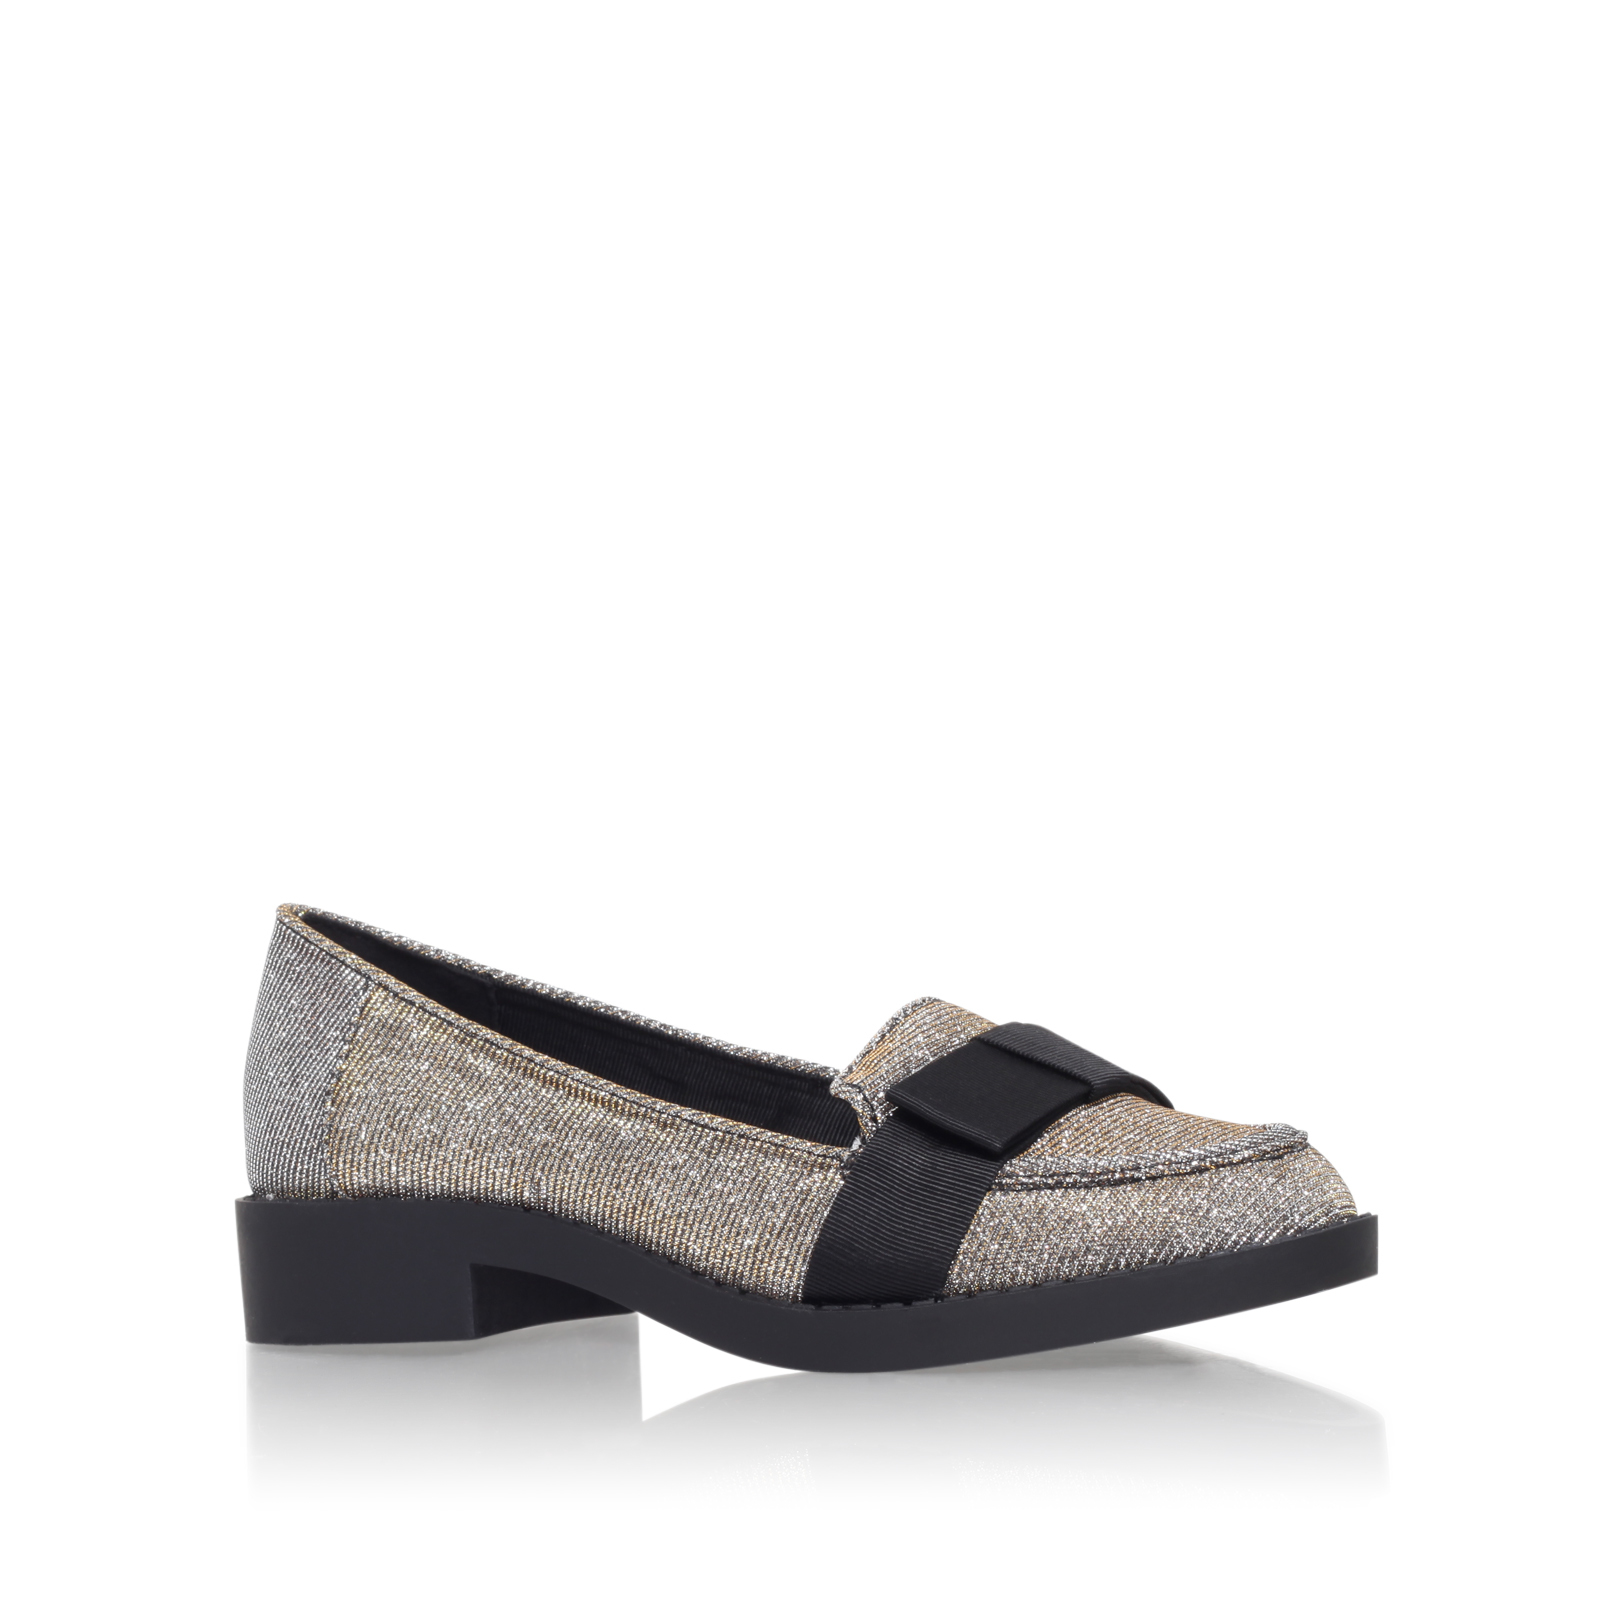 Carvela Cat Flat Shoes